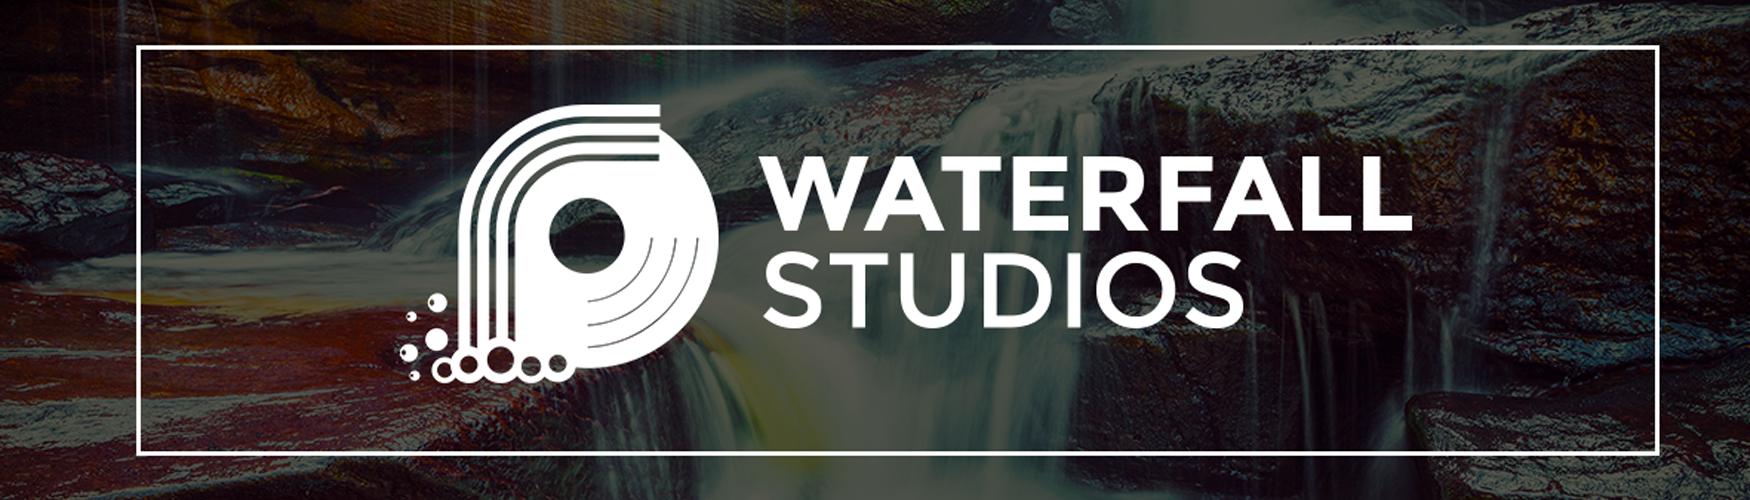 banner-waterfall